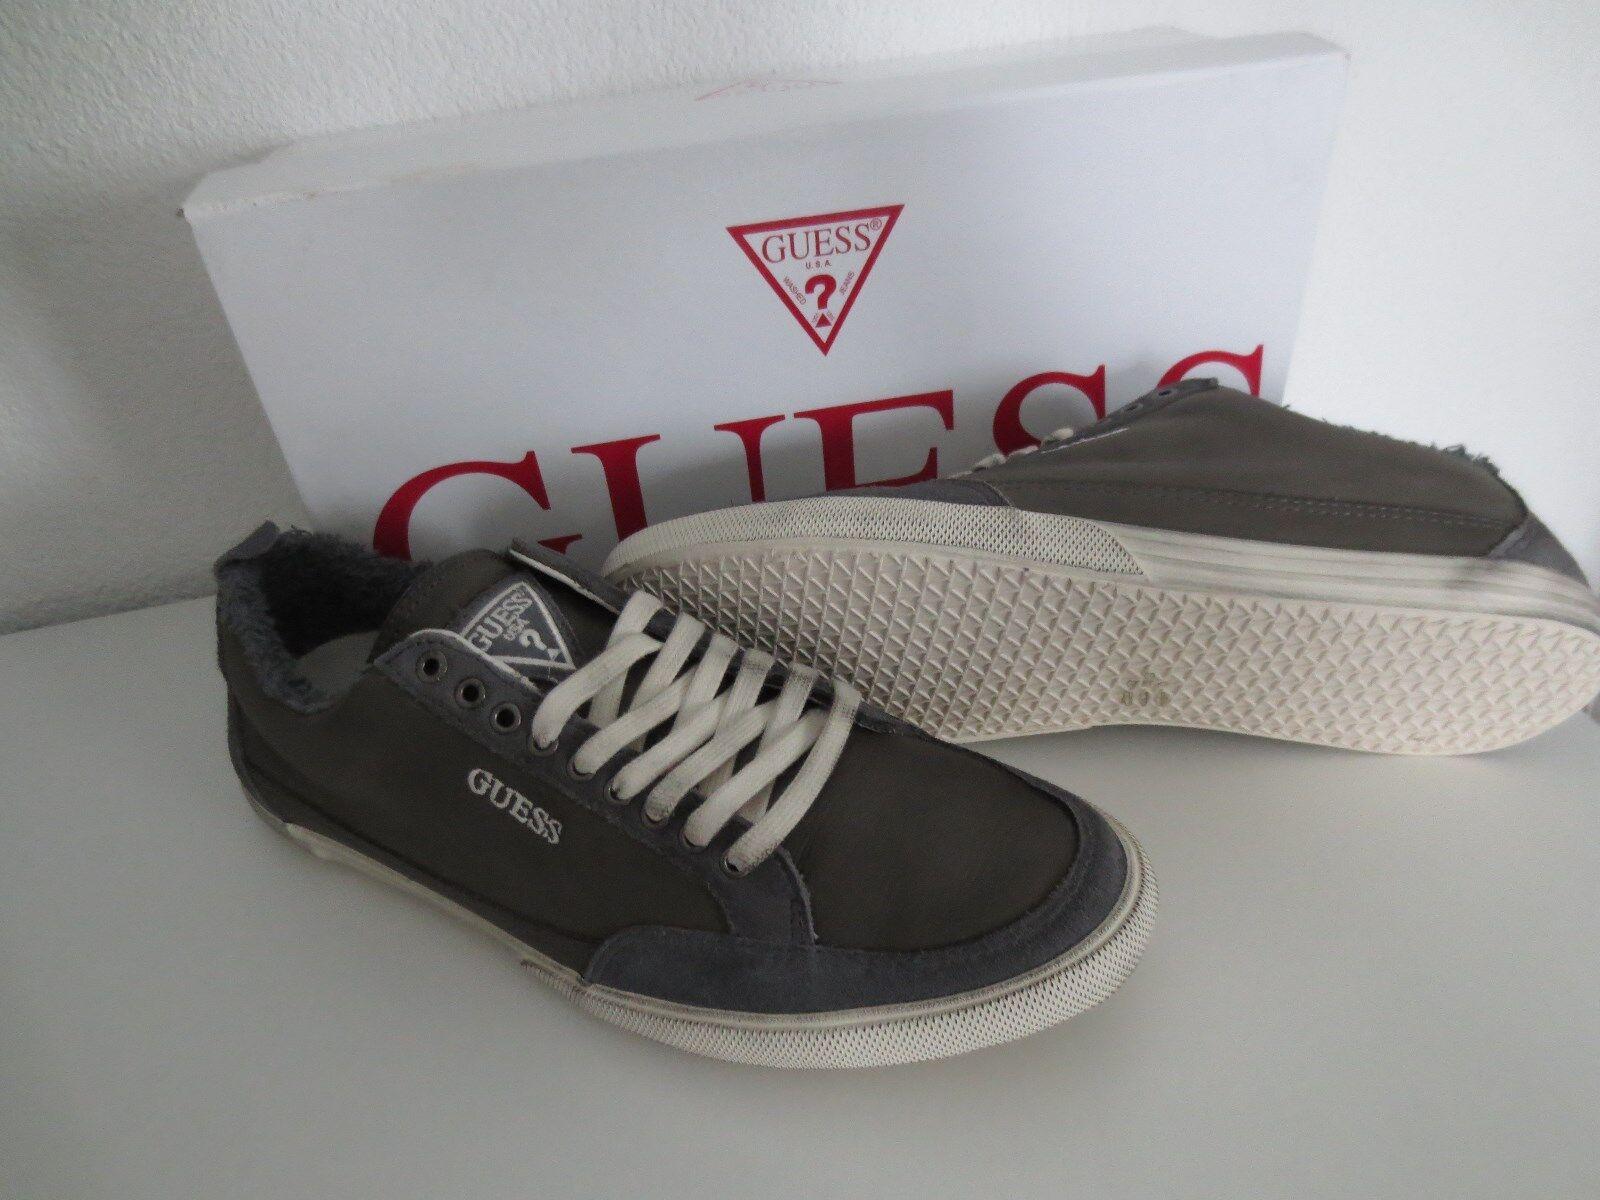 GUESS Herren Schuhe Gr. 43 Sneaker Dark neu Grau Leder Sneakers Turnschuhe neu Dark 271bc2